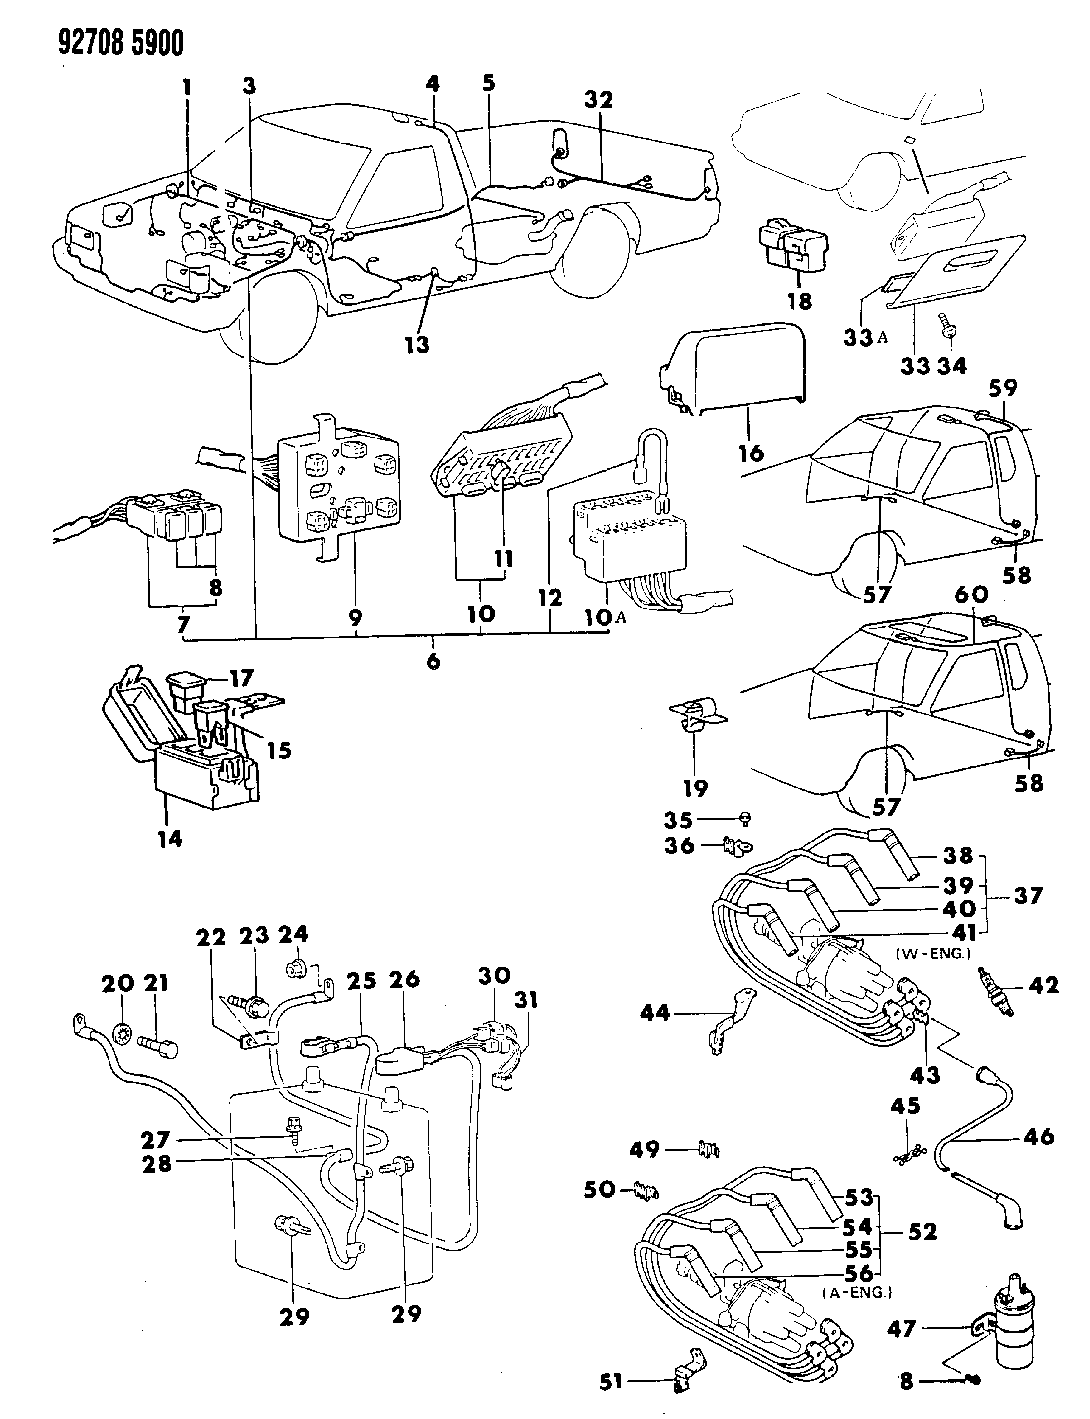 mb822142